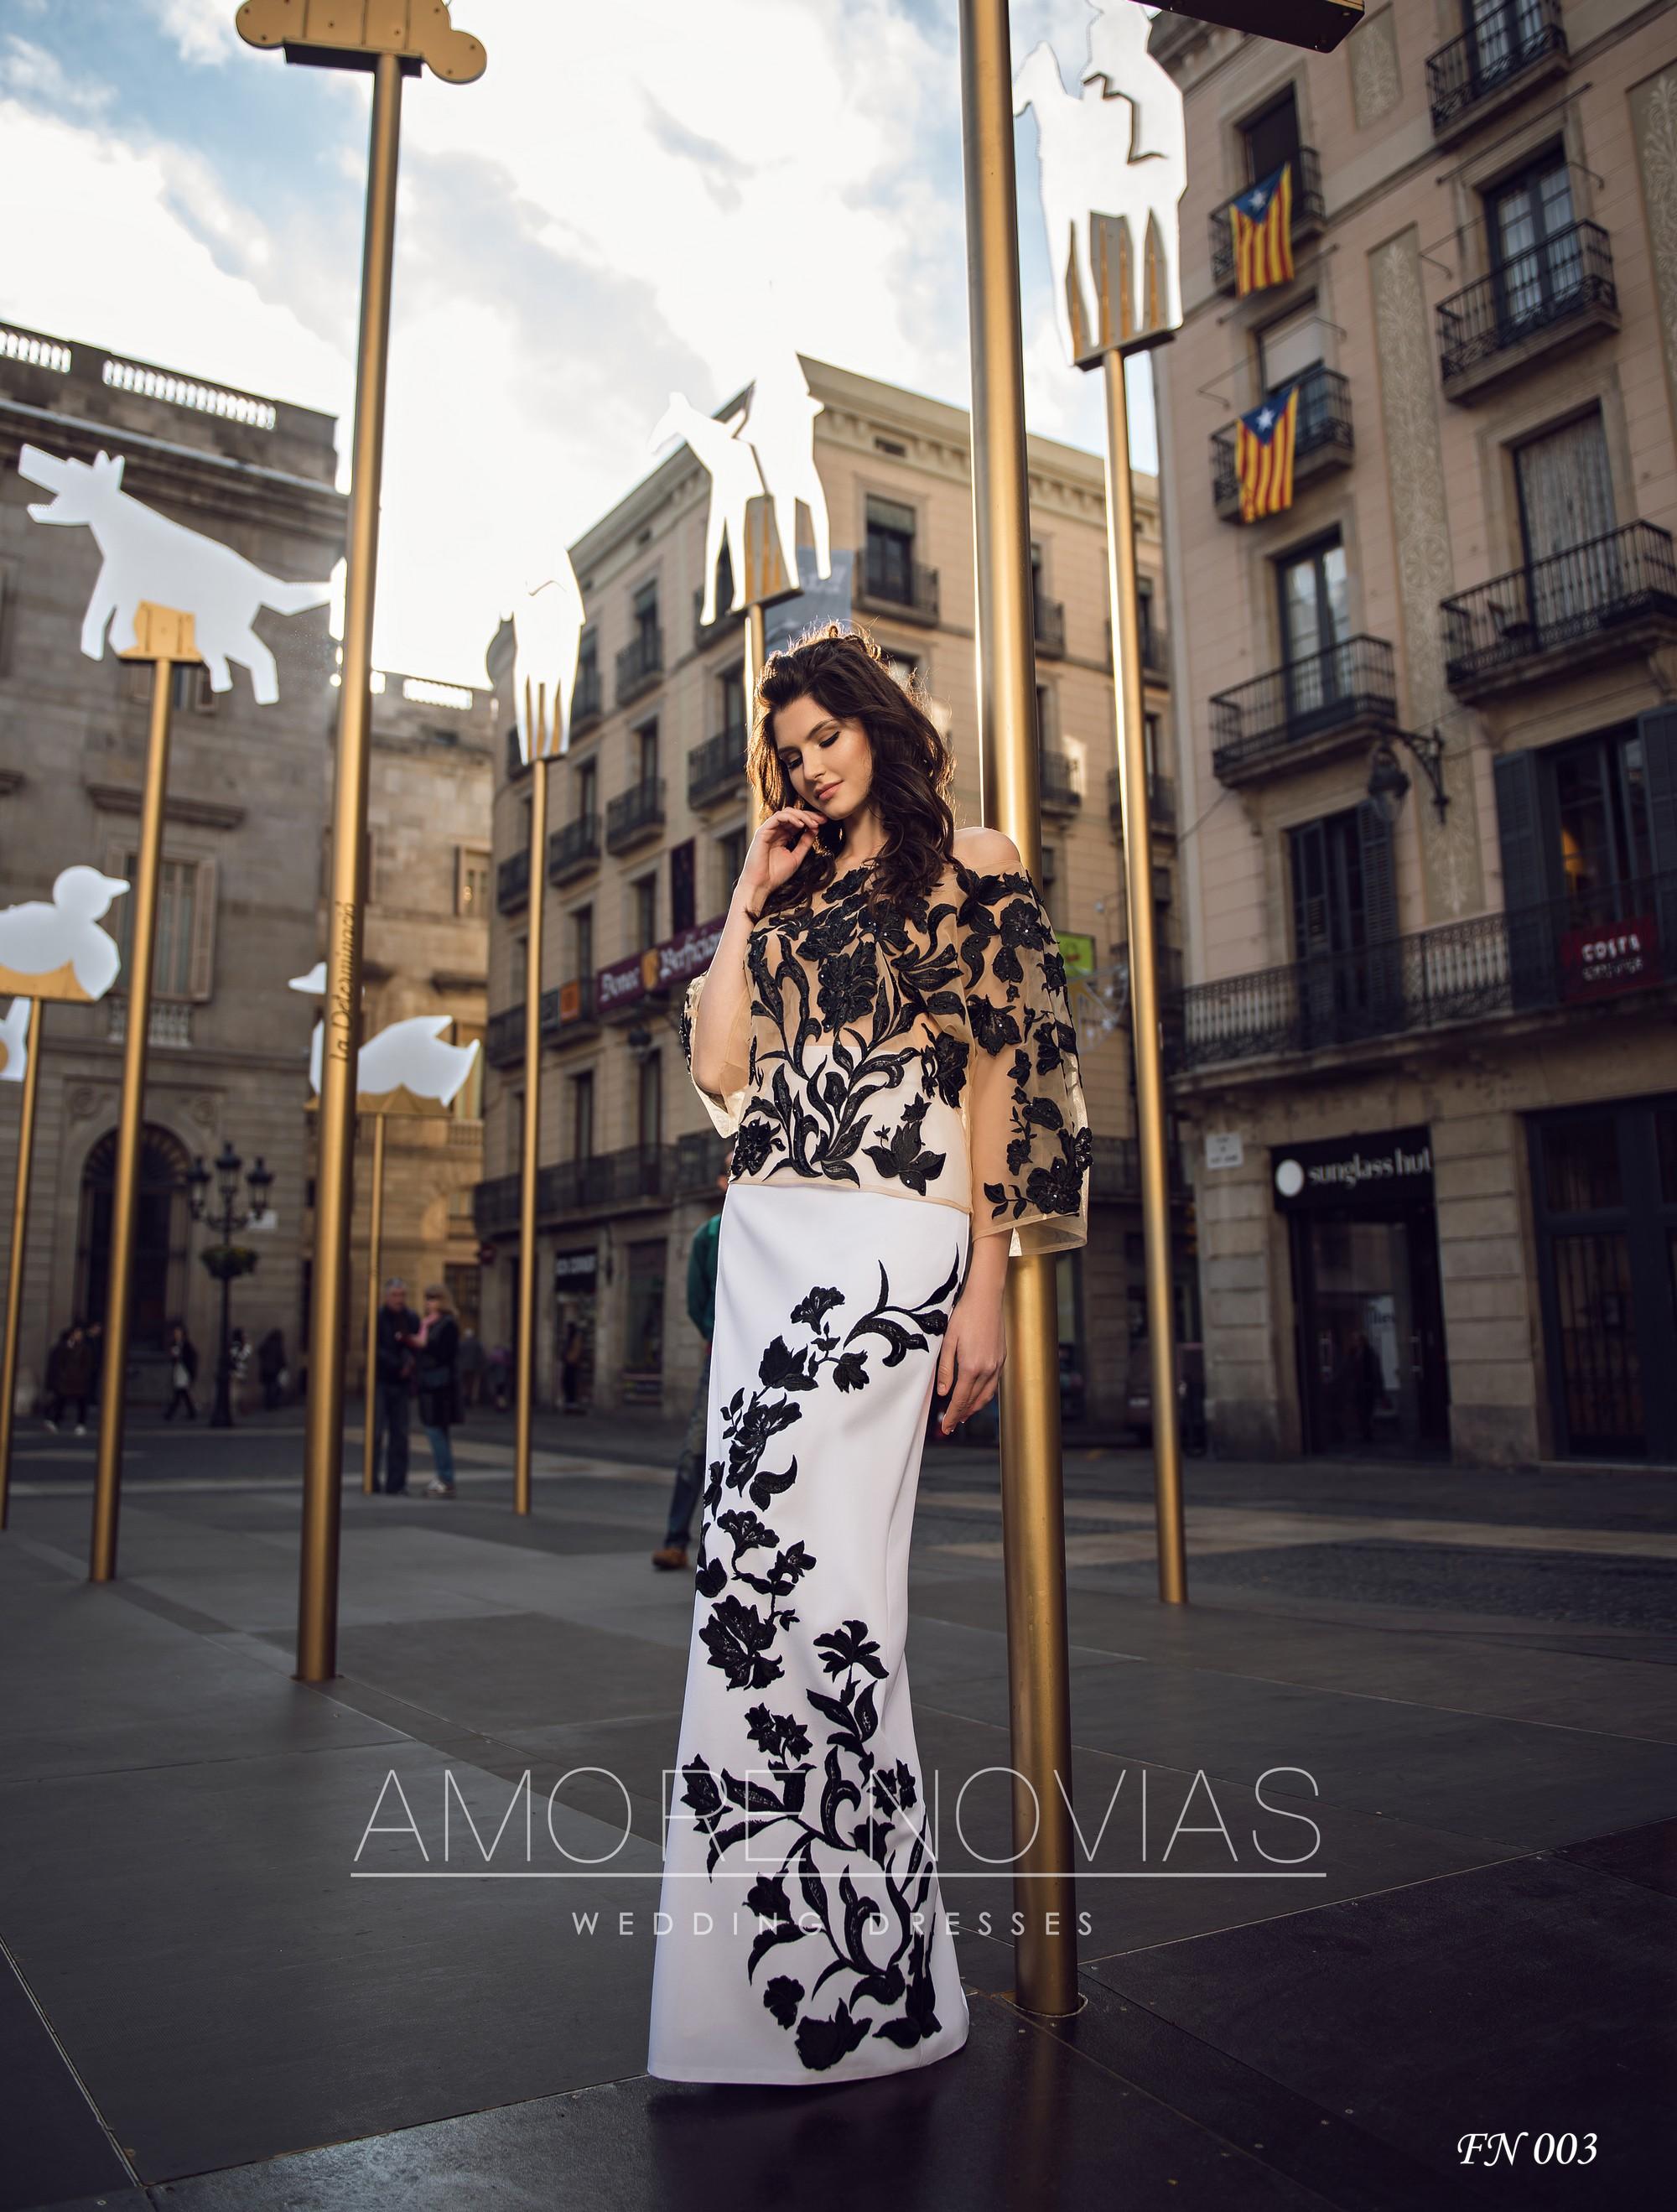 http://amore-novias.com/images/stories/virtuemart/product/fn-003--------(1).jpg